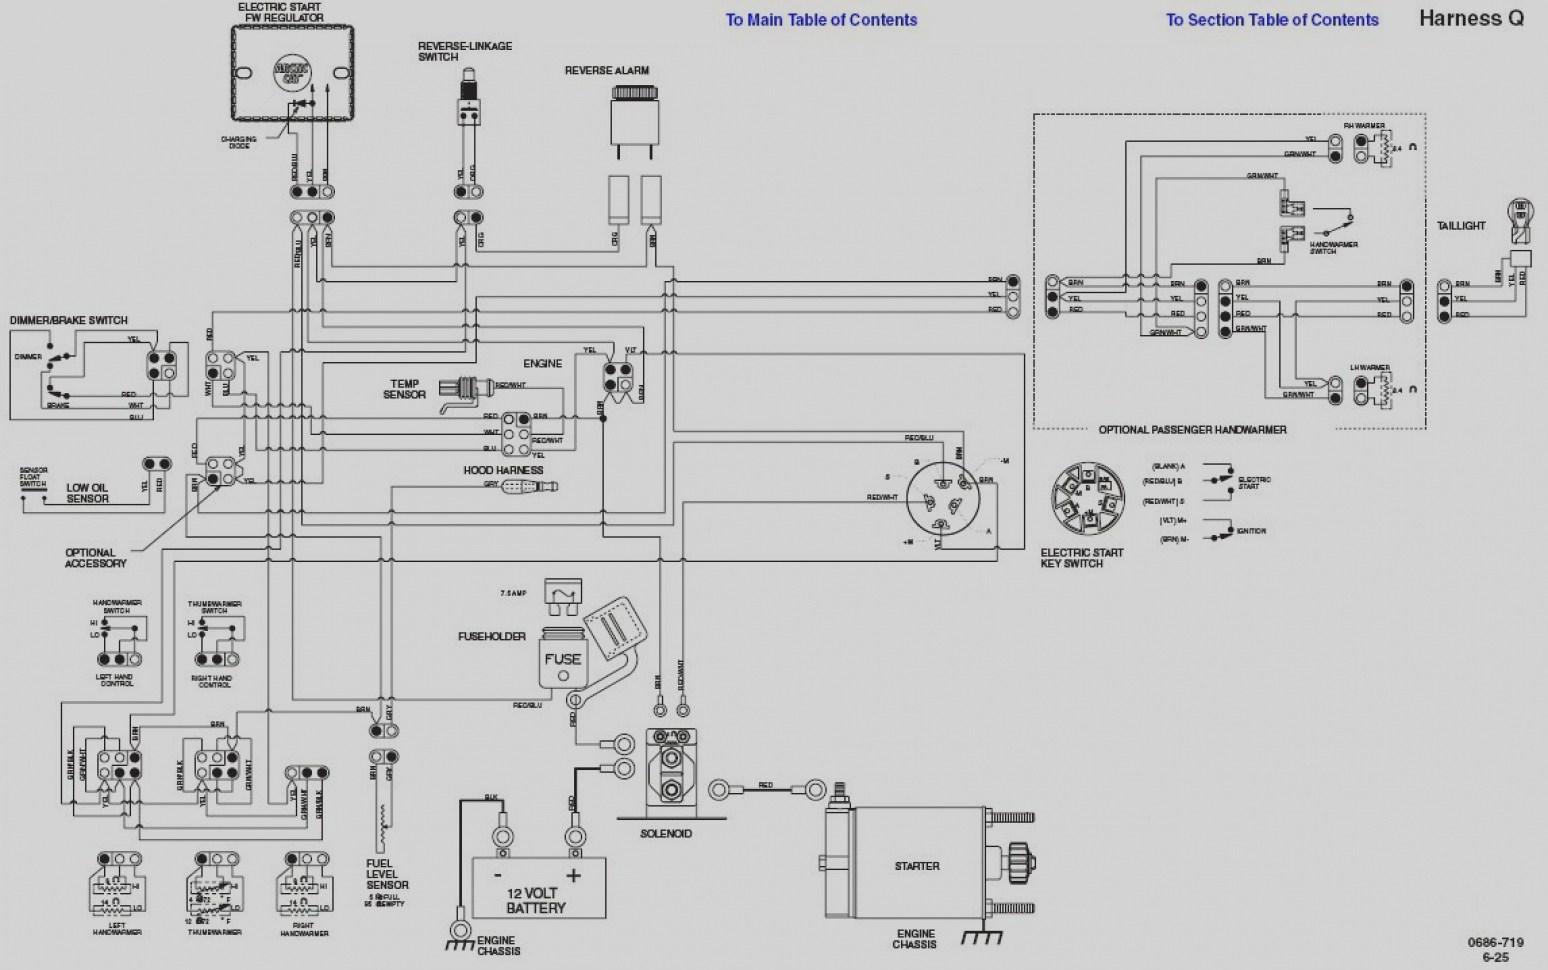 KW_6102] Polaris Wiring Diagram On Polaris Sportsman 800 Wiring Diagram  Wiring DiagramSiry Xorcede Mohammedshrine Librar Wiring 101